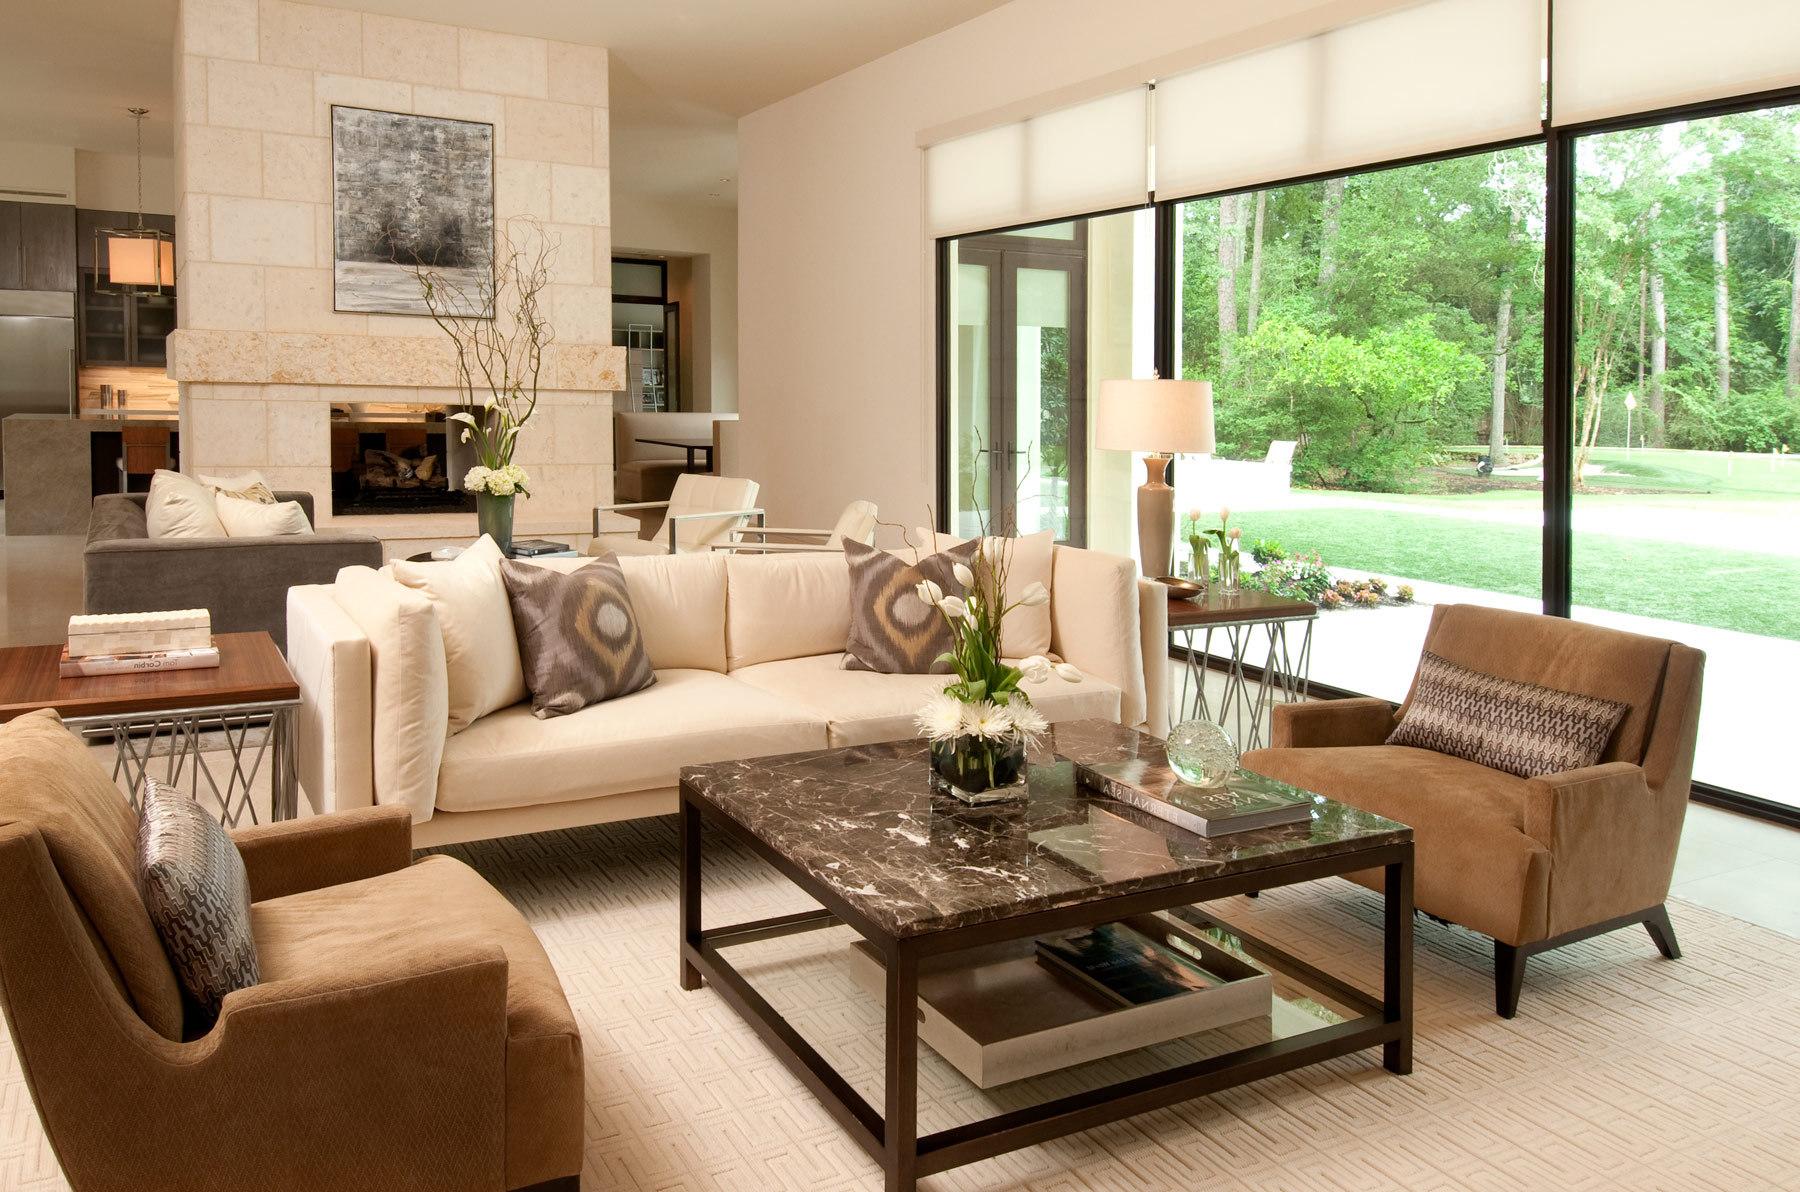 27 Comfortable Living Room Design Ideas - Decoration Love on Comfortable Living  id=84089